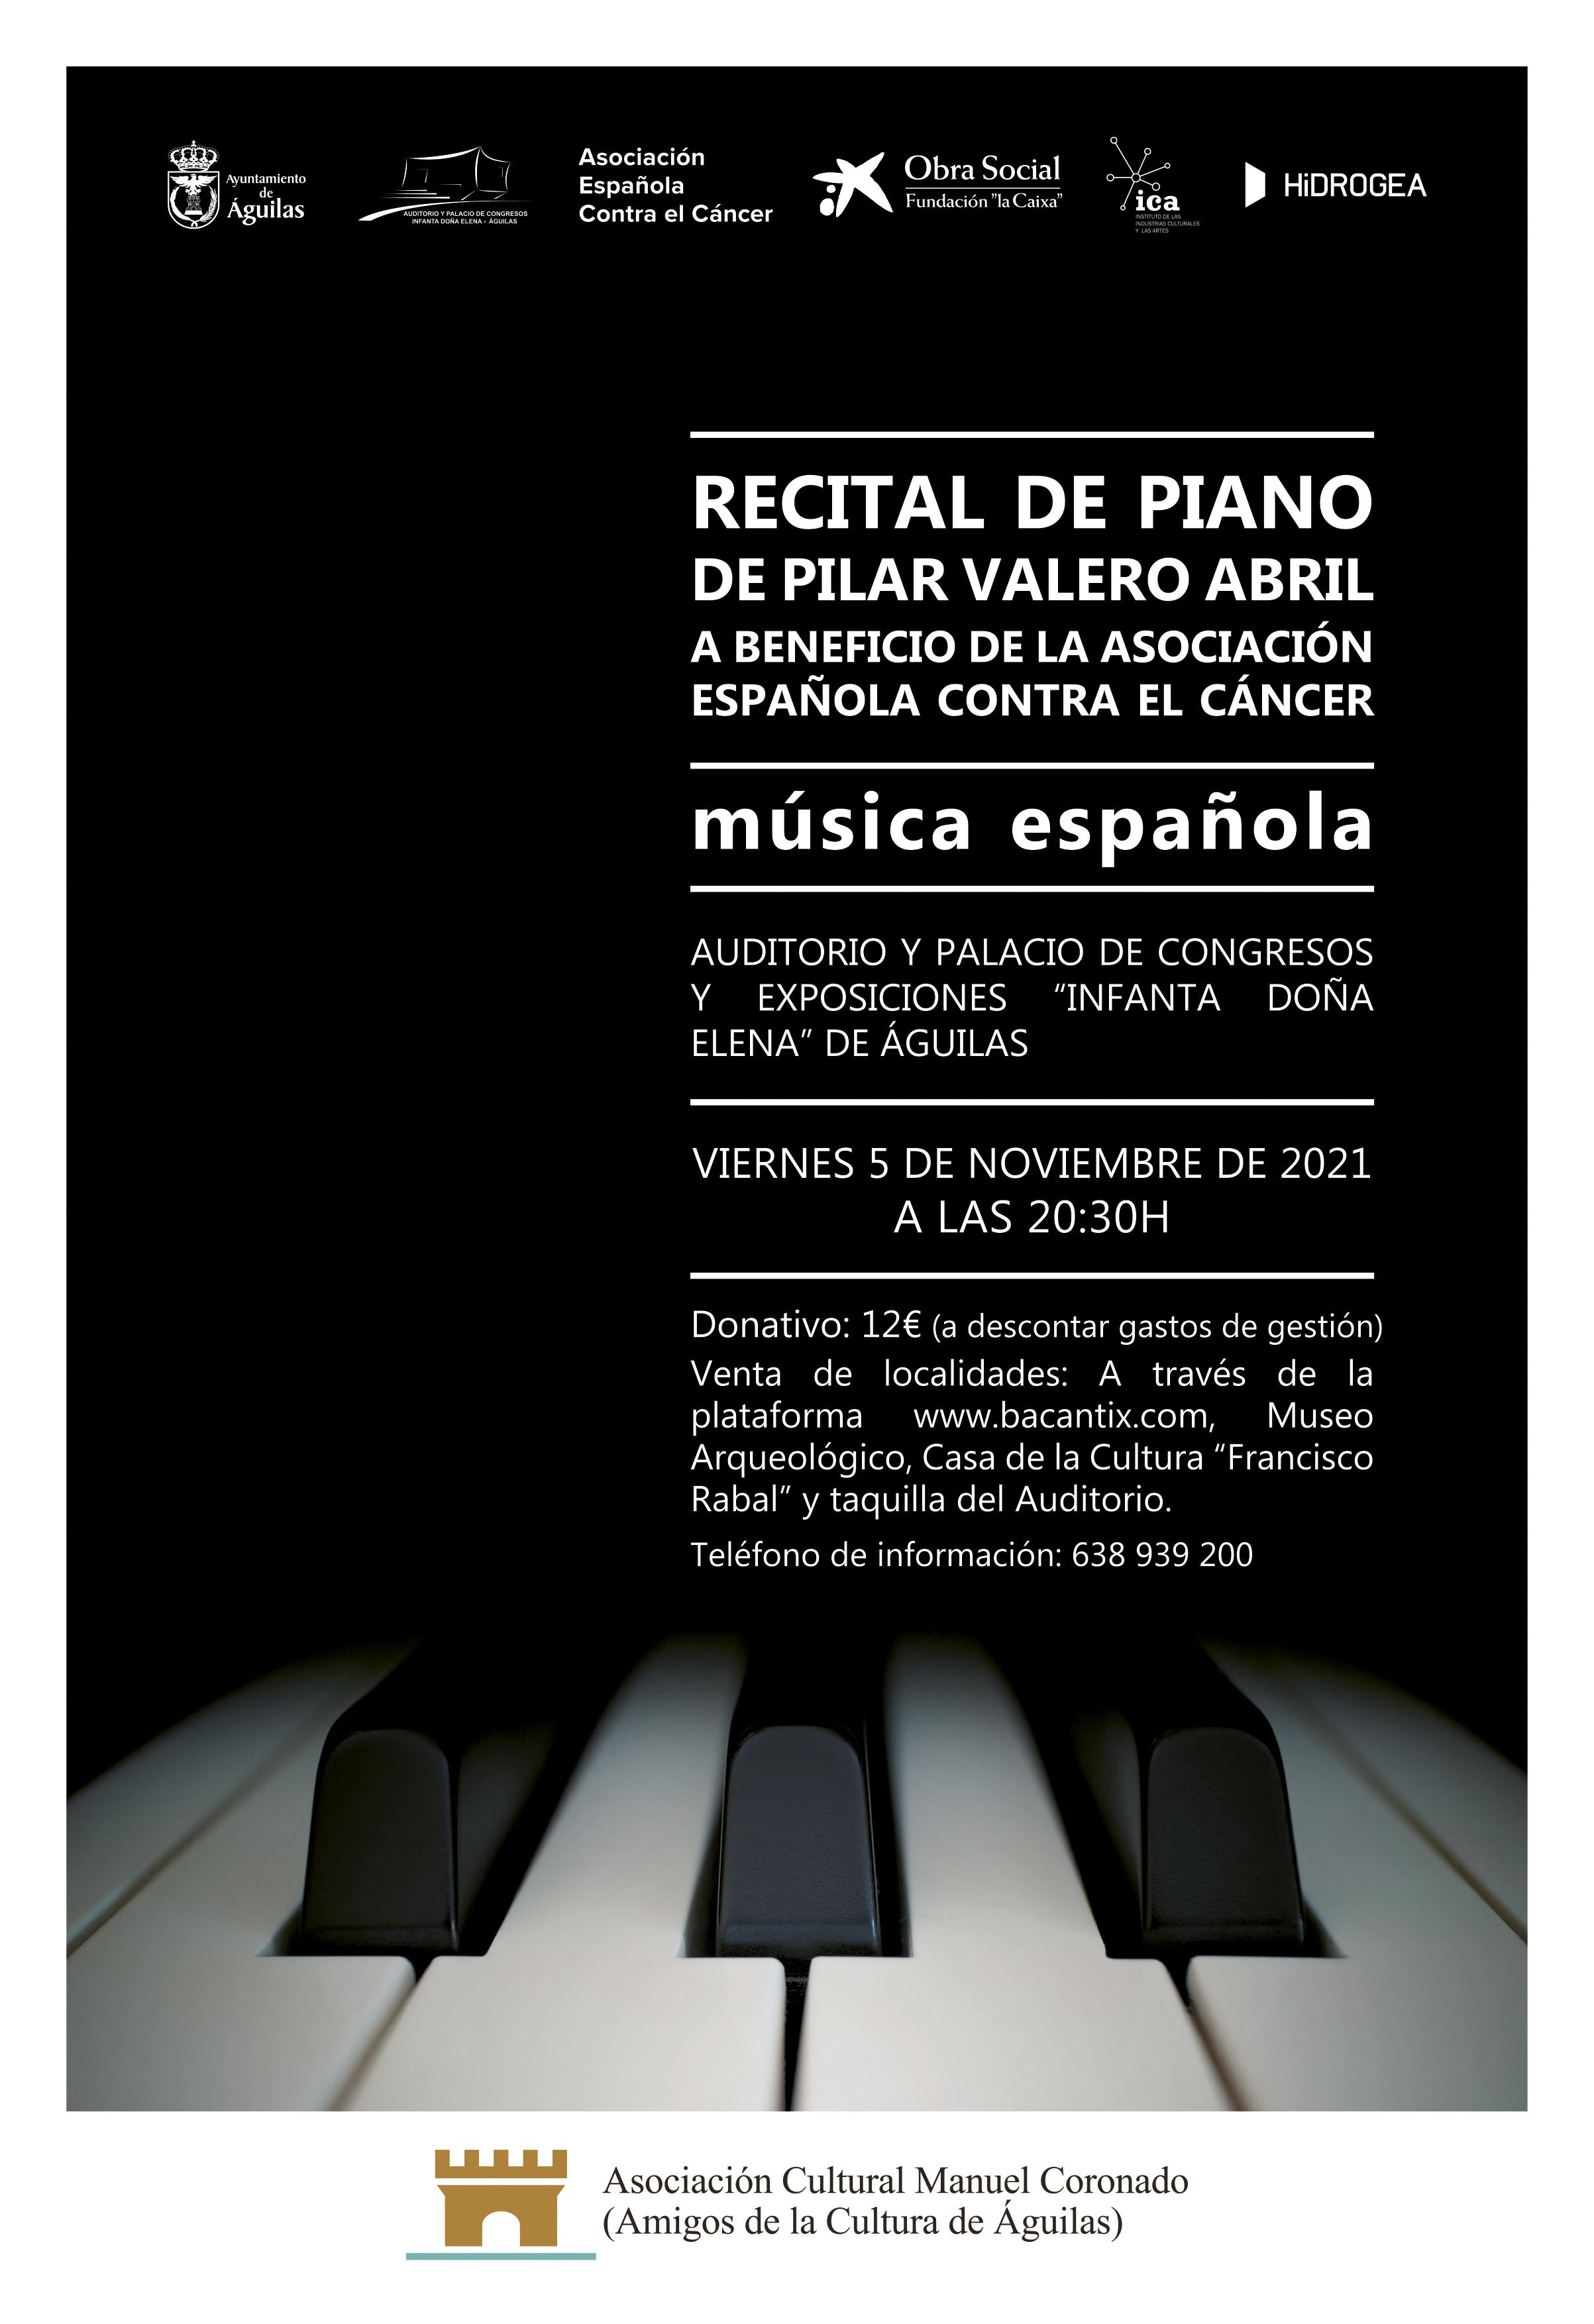 Recital de Piano de Pilar Valero Abril